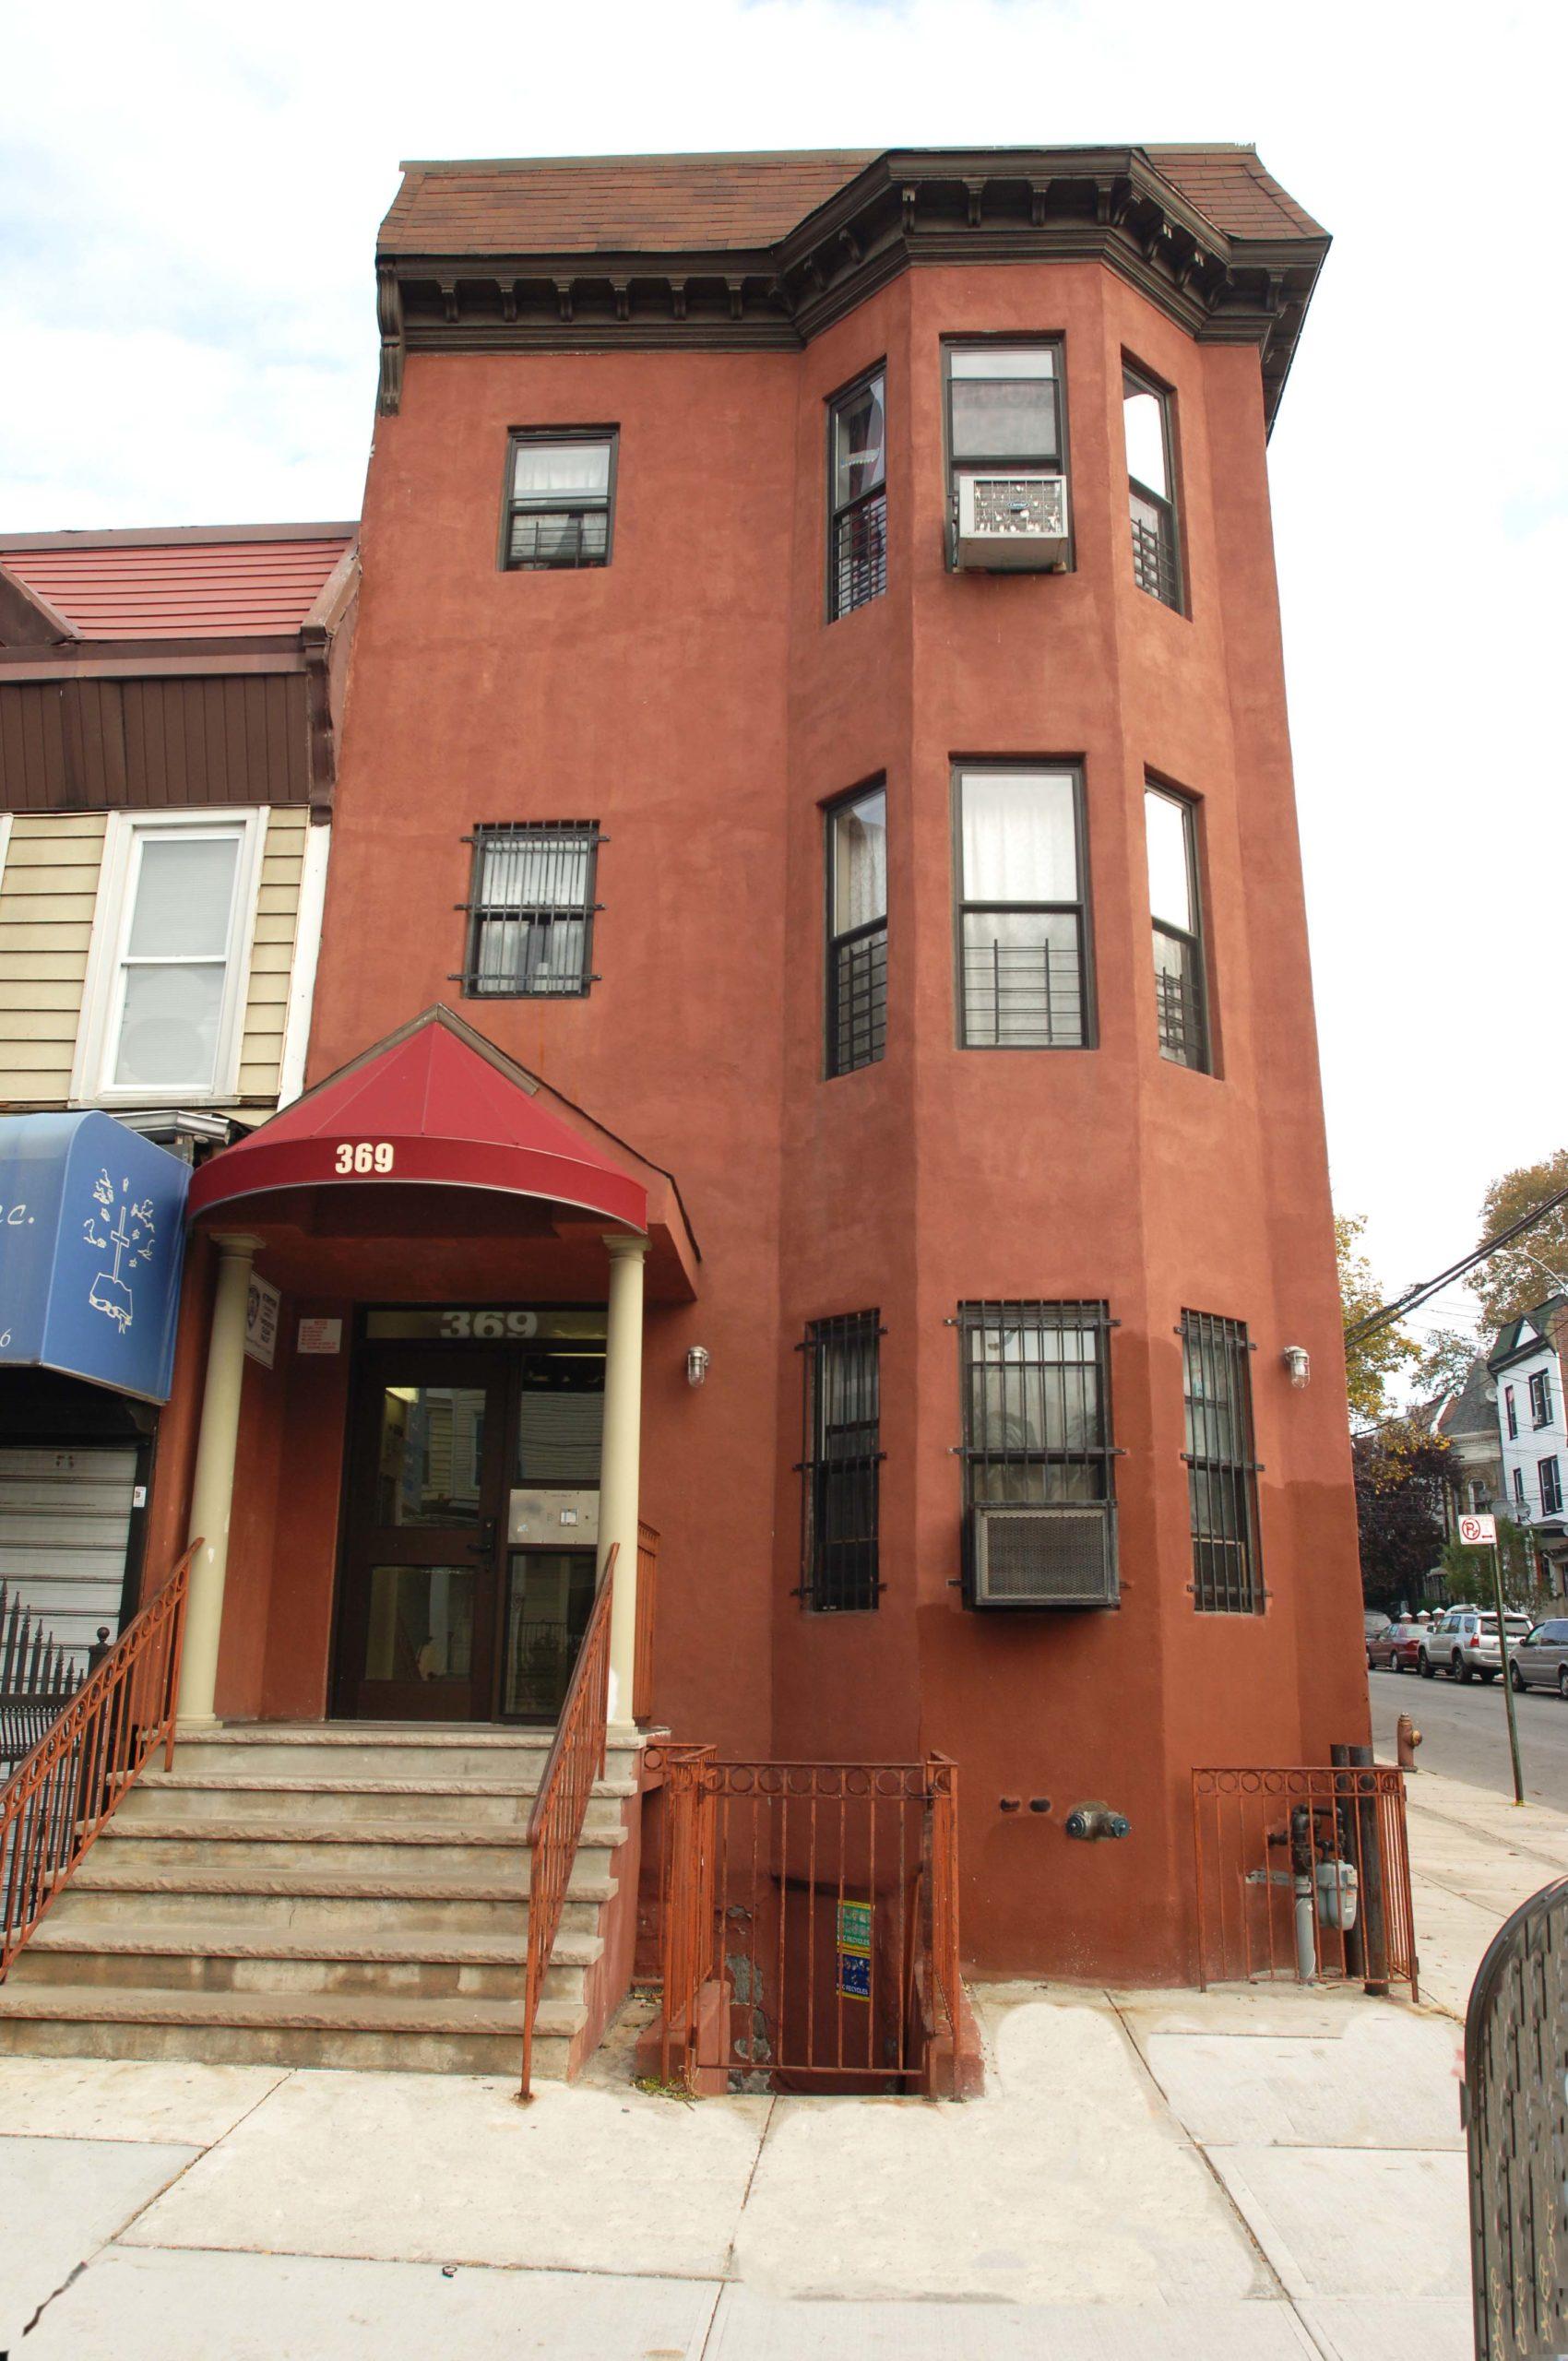 369 East 169th Street